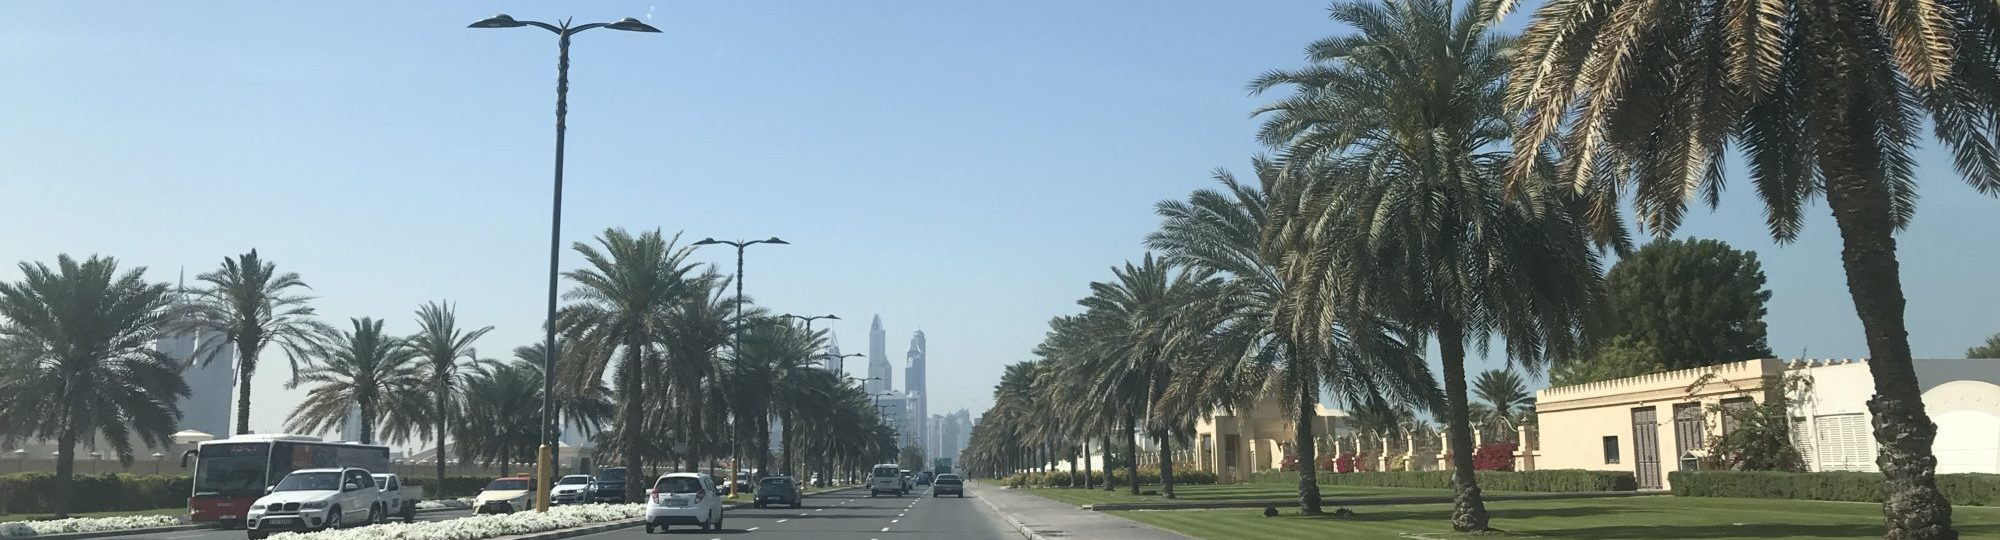 Header plog 11 Dubai wat ben je mooi